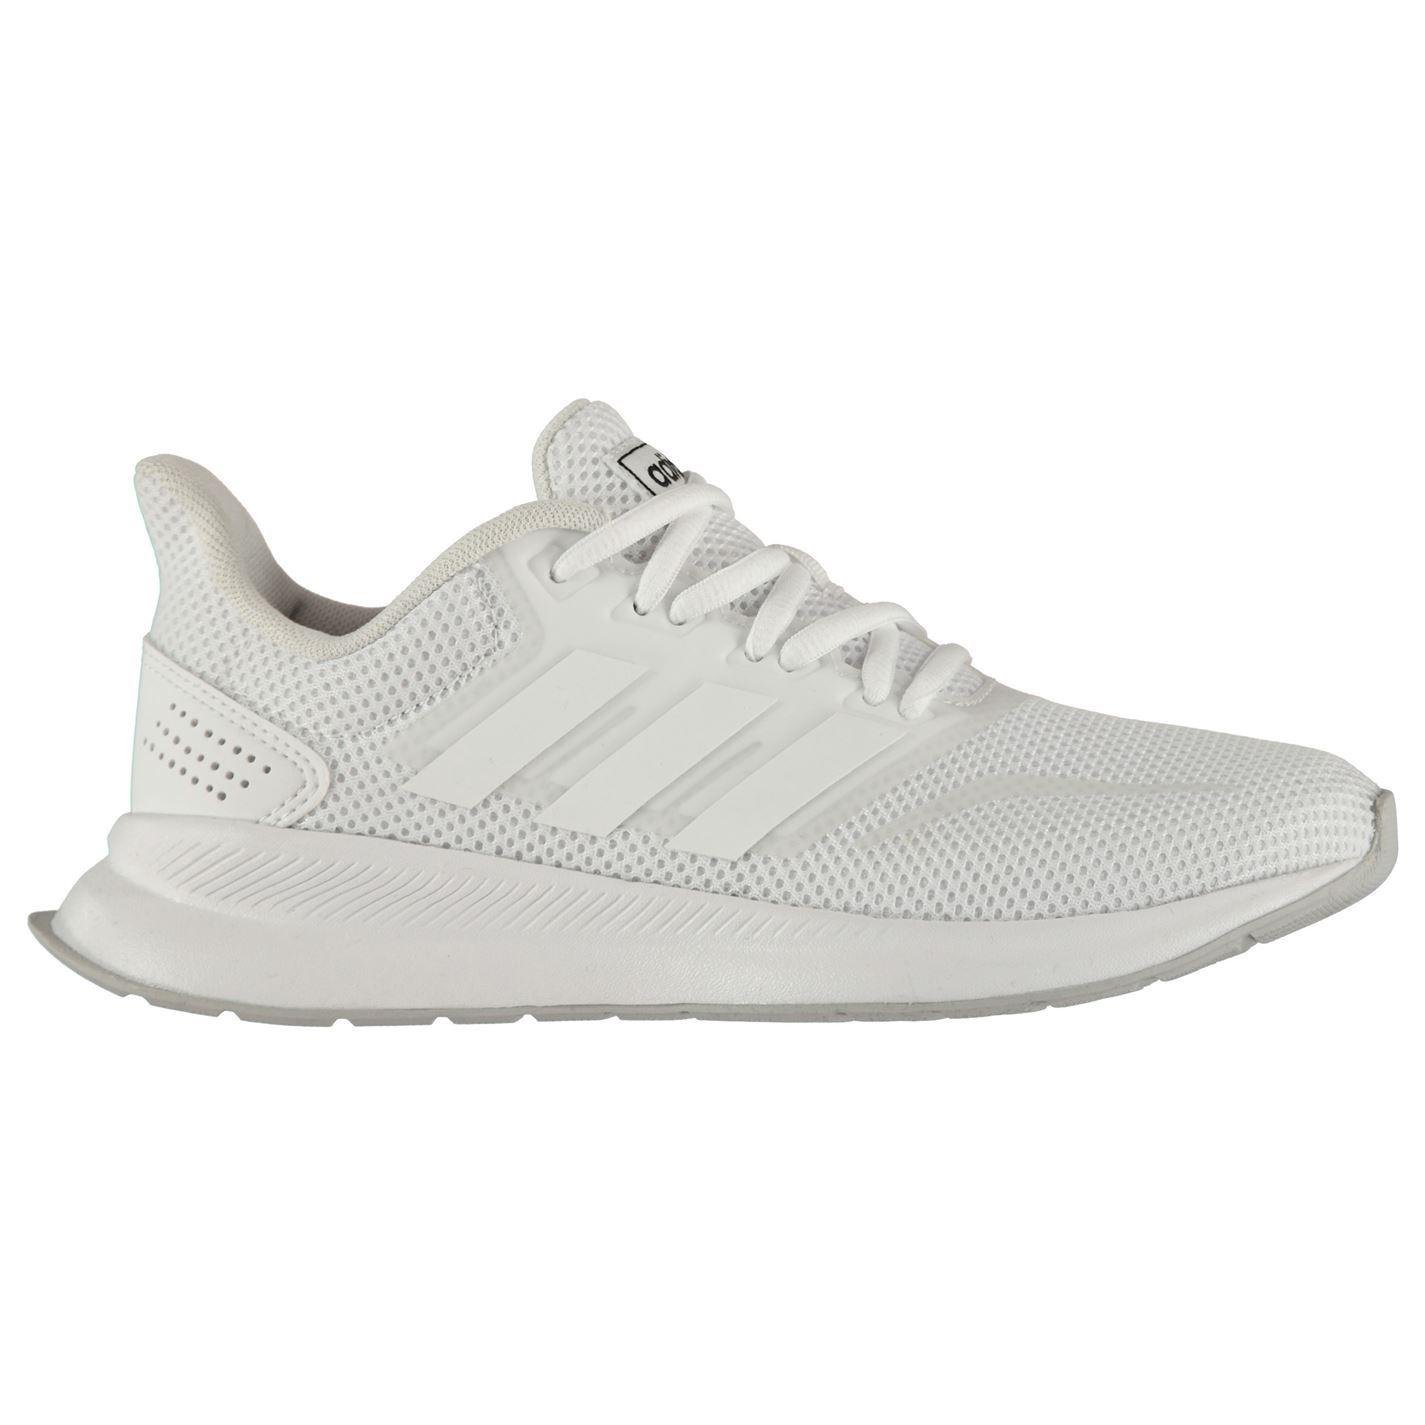 adidas-Falcon-Trainers-Junior-Boys-Shoes-Footwear thumbnail 11